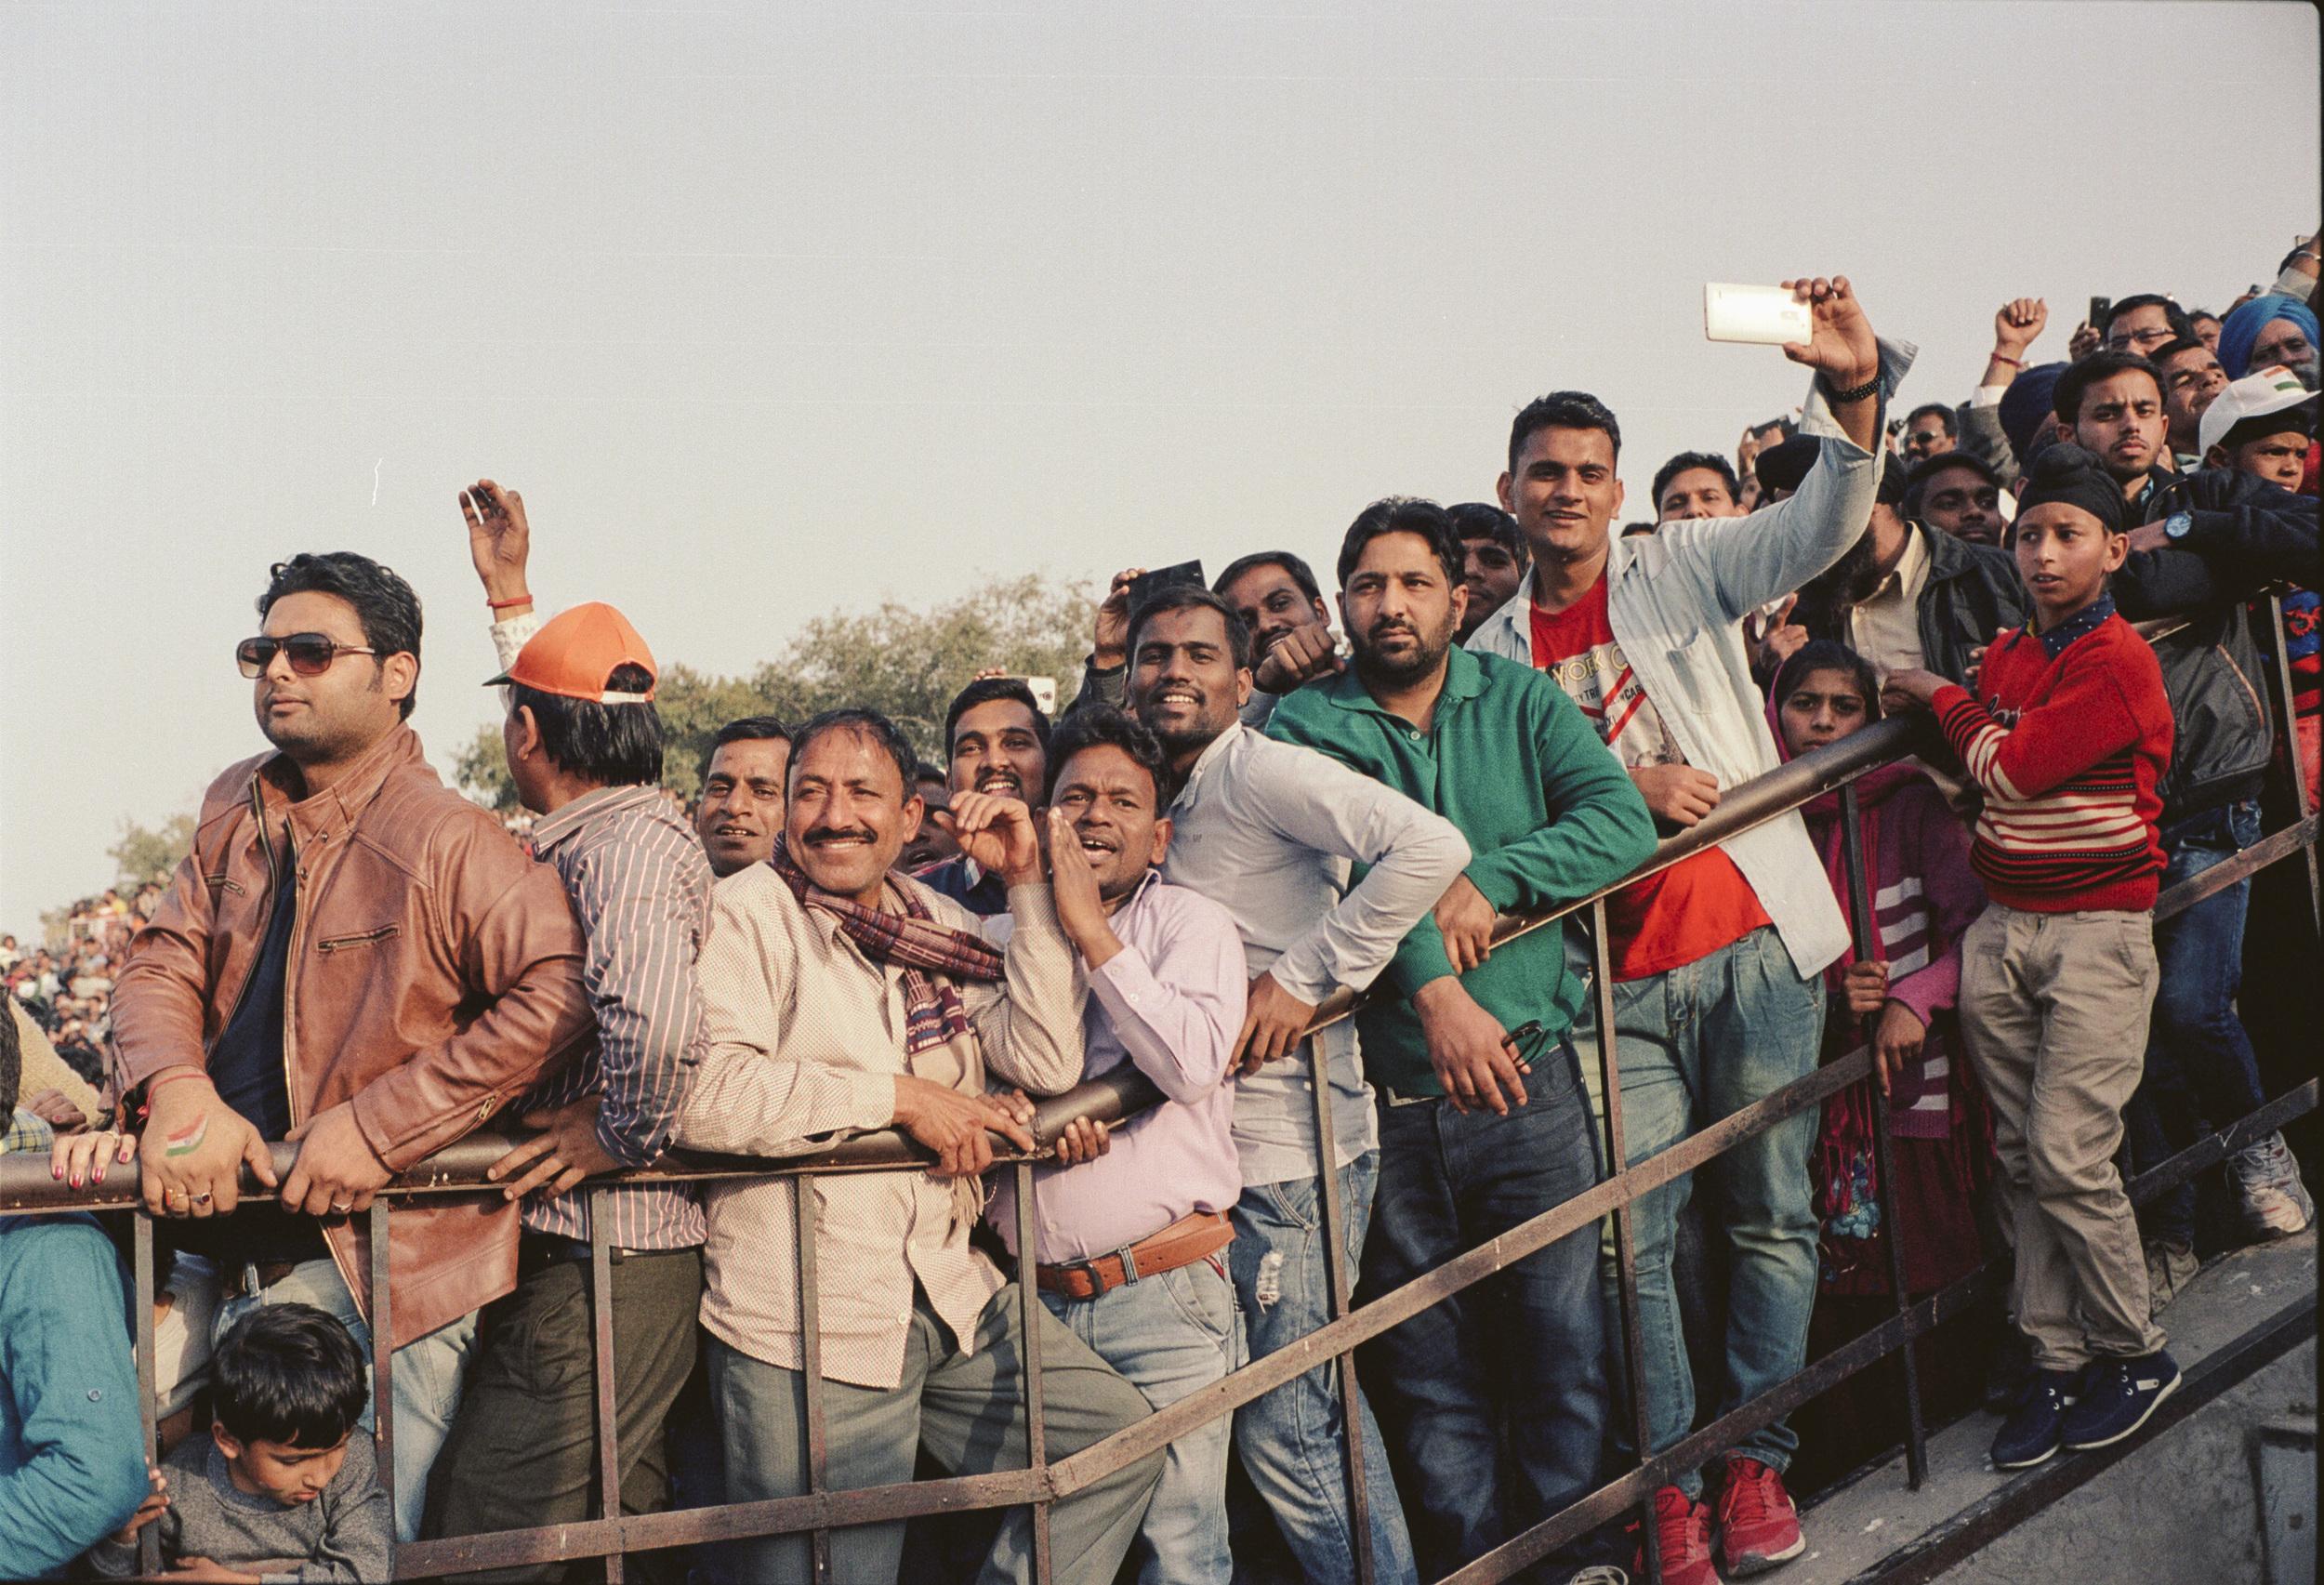 70-F25_Pakistani Boarder near Amritsar, India, 2016-46.jpg